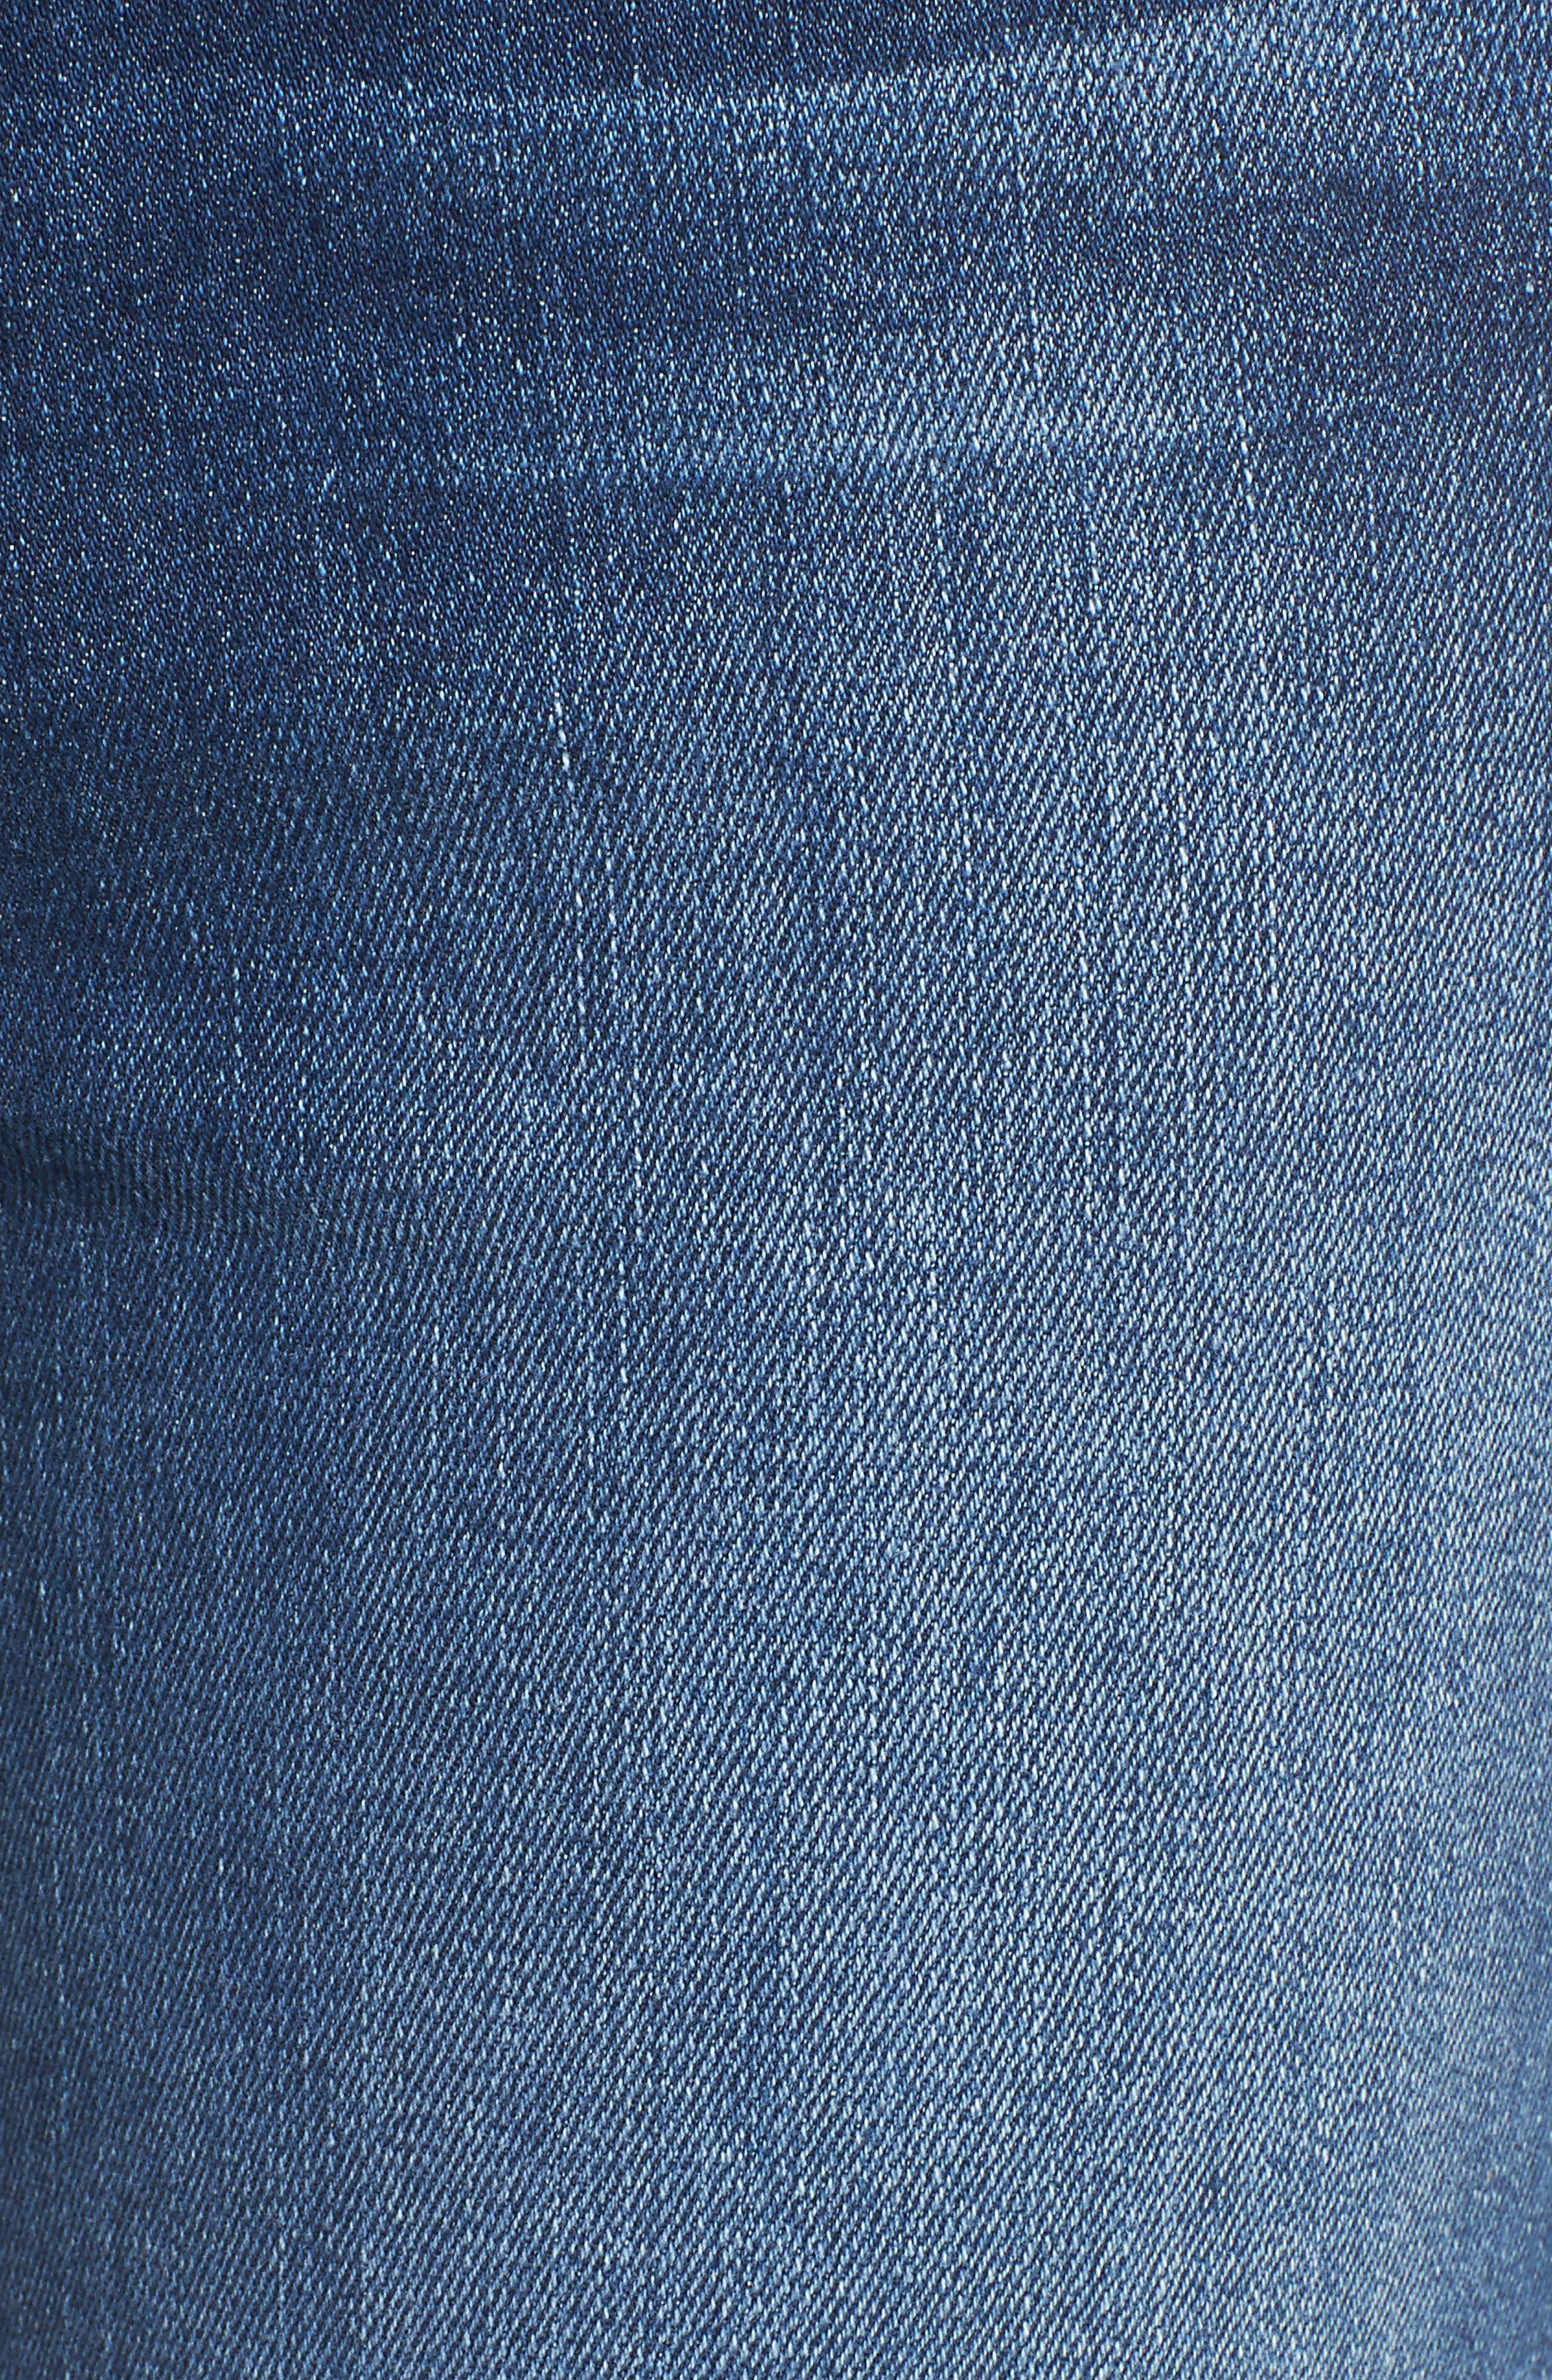 Transcend - Hoxton Ankle Straight Leg Jeans,                             Alternate thumbnail 6, color,                             400